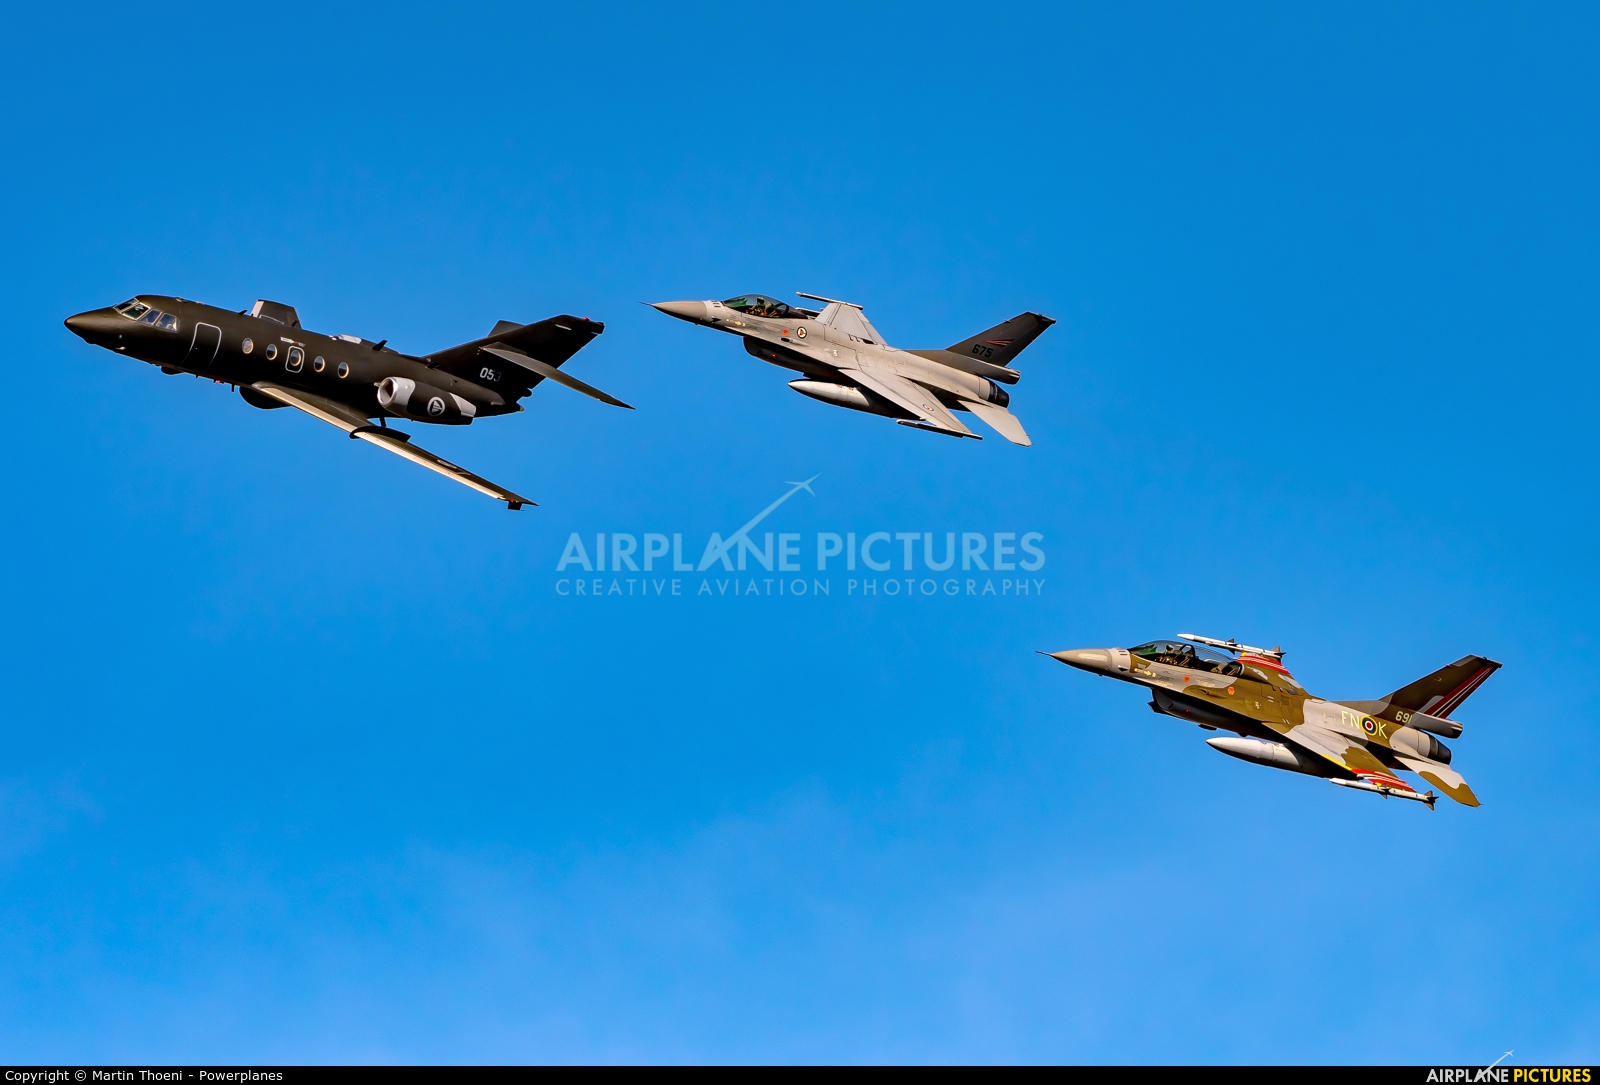 Norway - Royal Norwegian Air Force 053 aircraft at Leopoldsburg - Beverlo